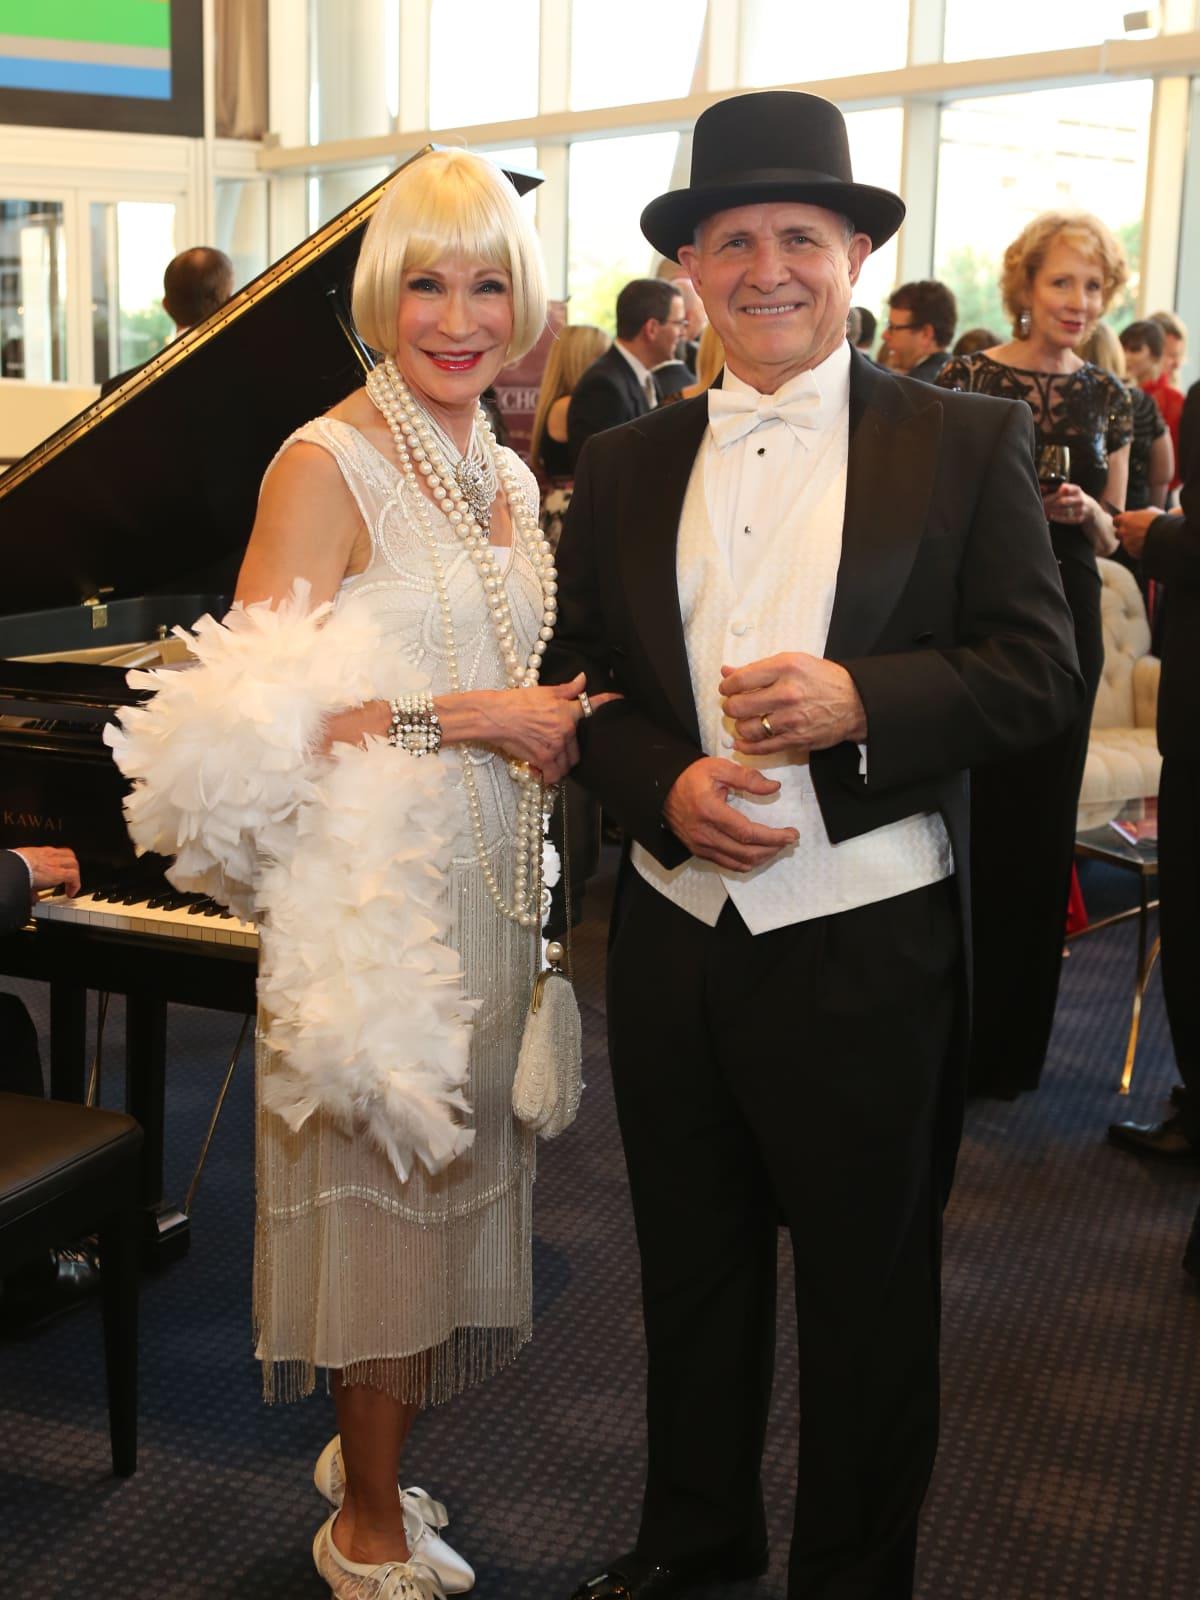 TUTS Gala 4/2016, Patric McKinney, Pete McKinney